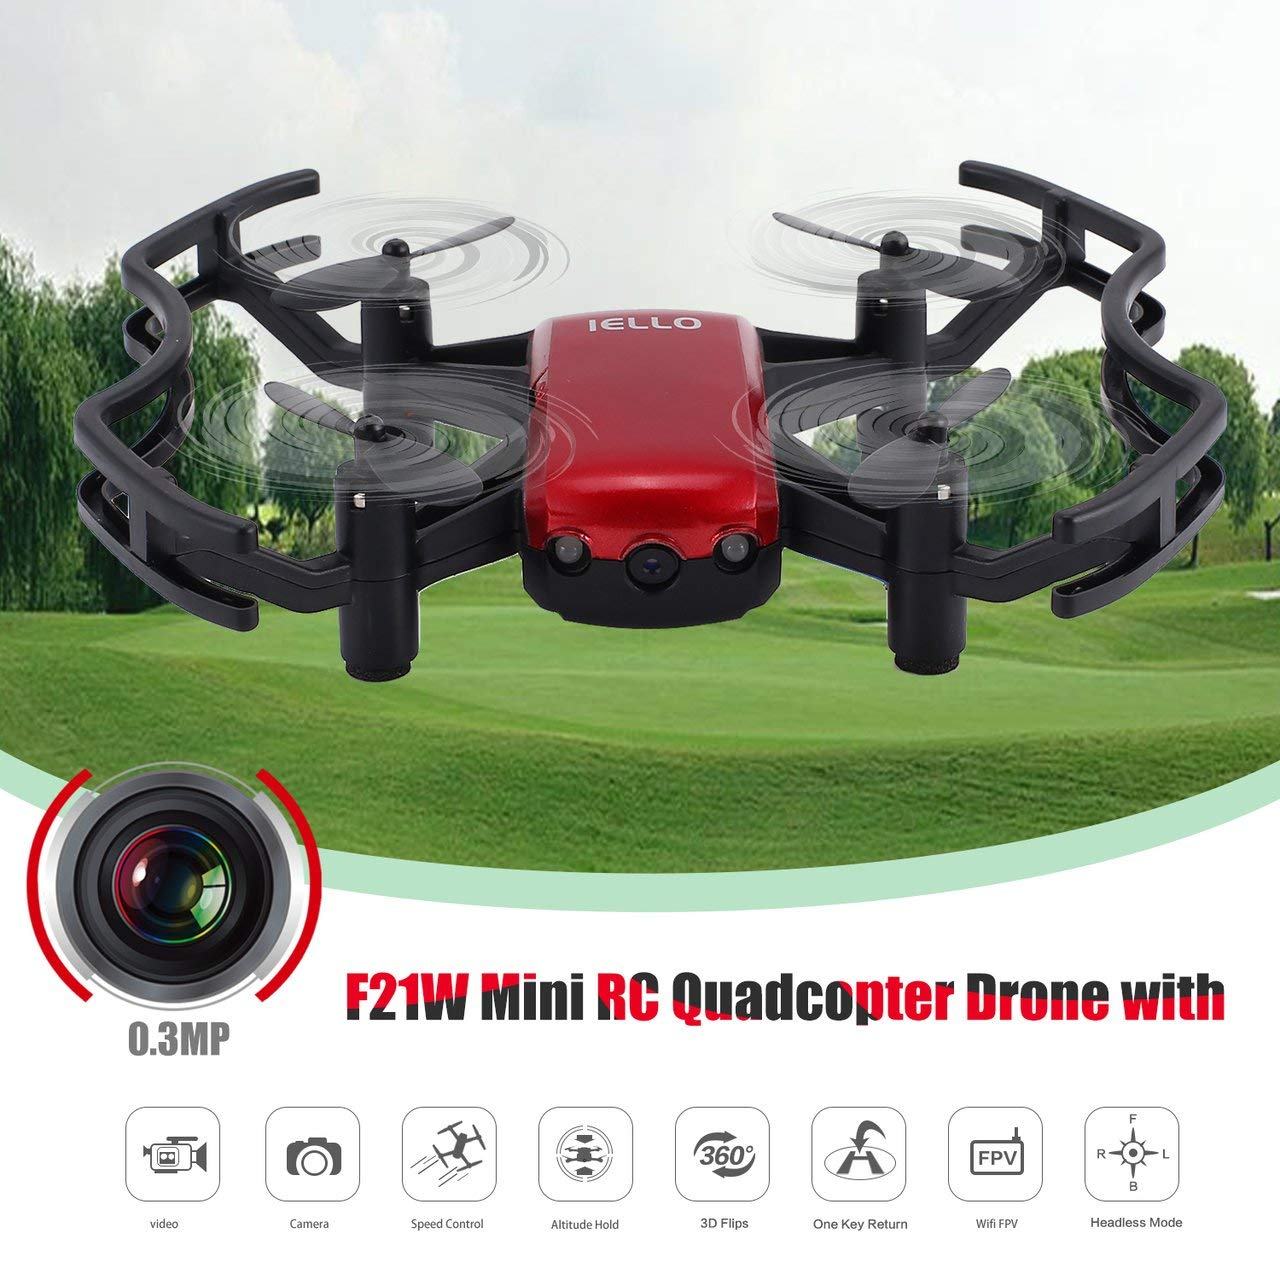 F21W Mini RC RC RC Quadcopter Drohne mit 0.3MP Kamera Höhe Halten Headless-Modus 0fcabf